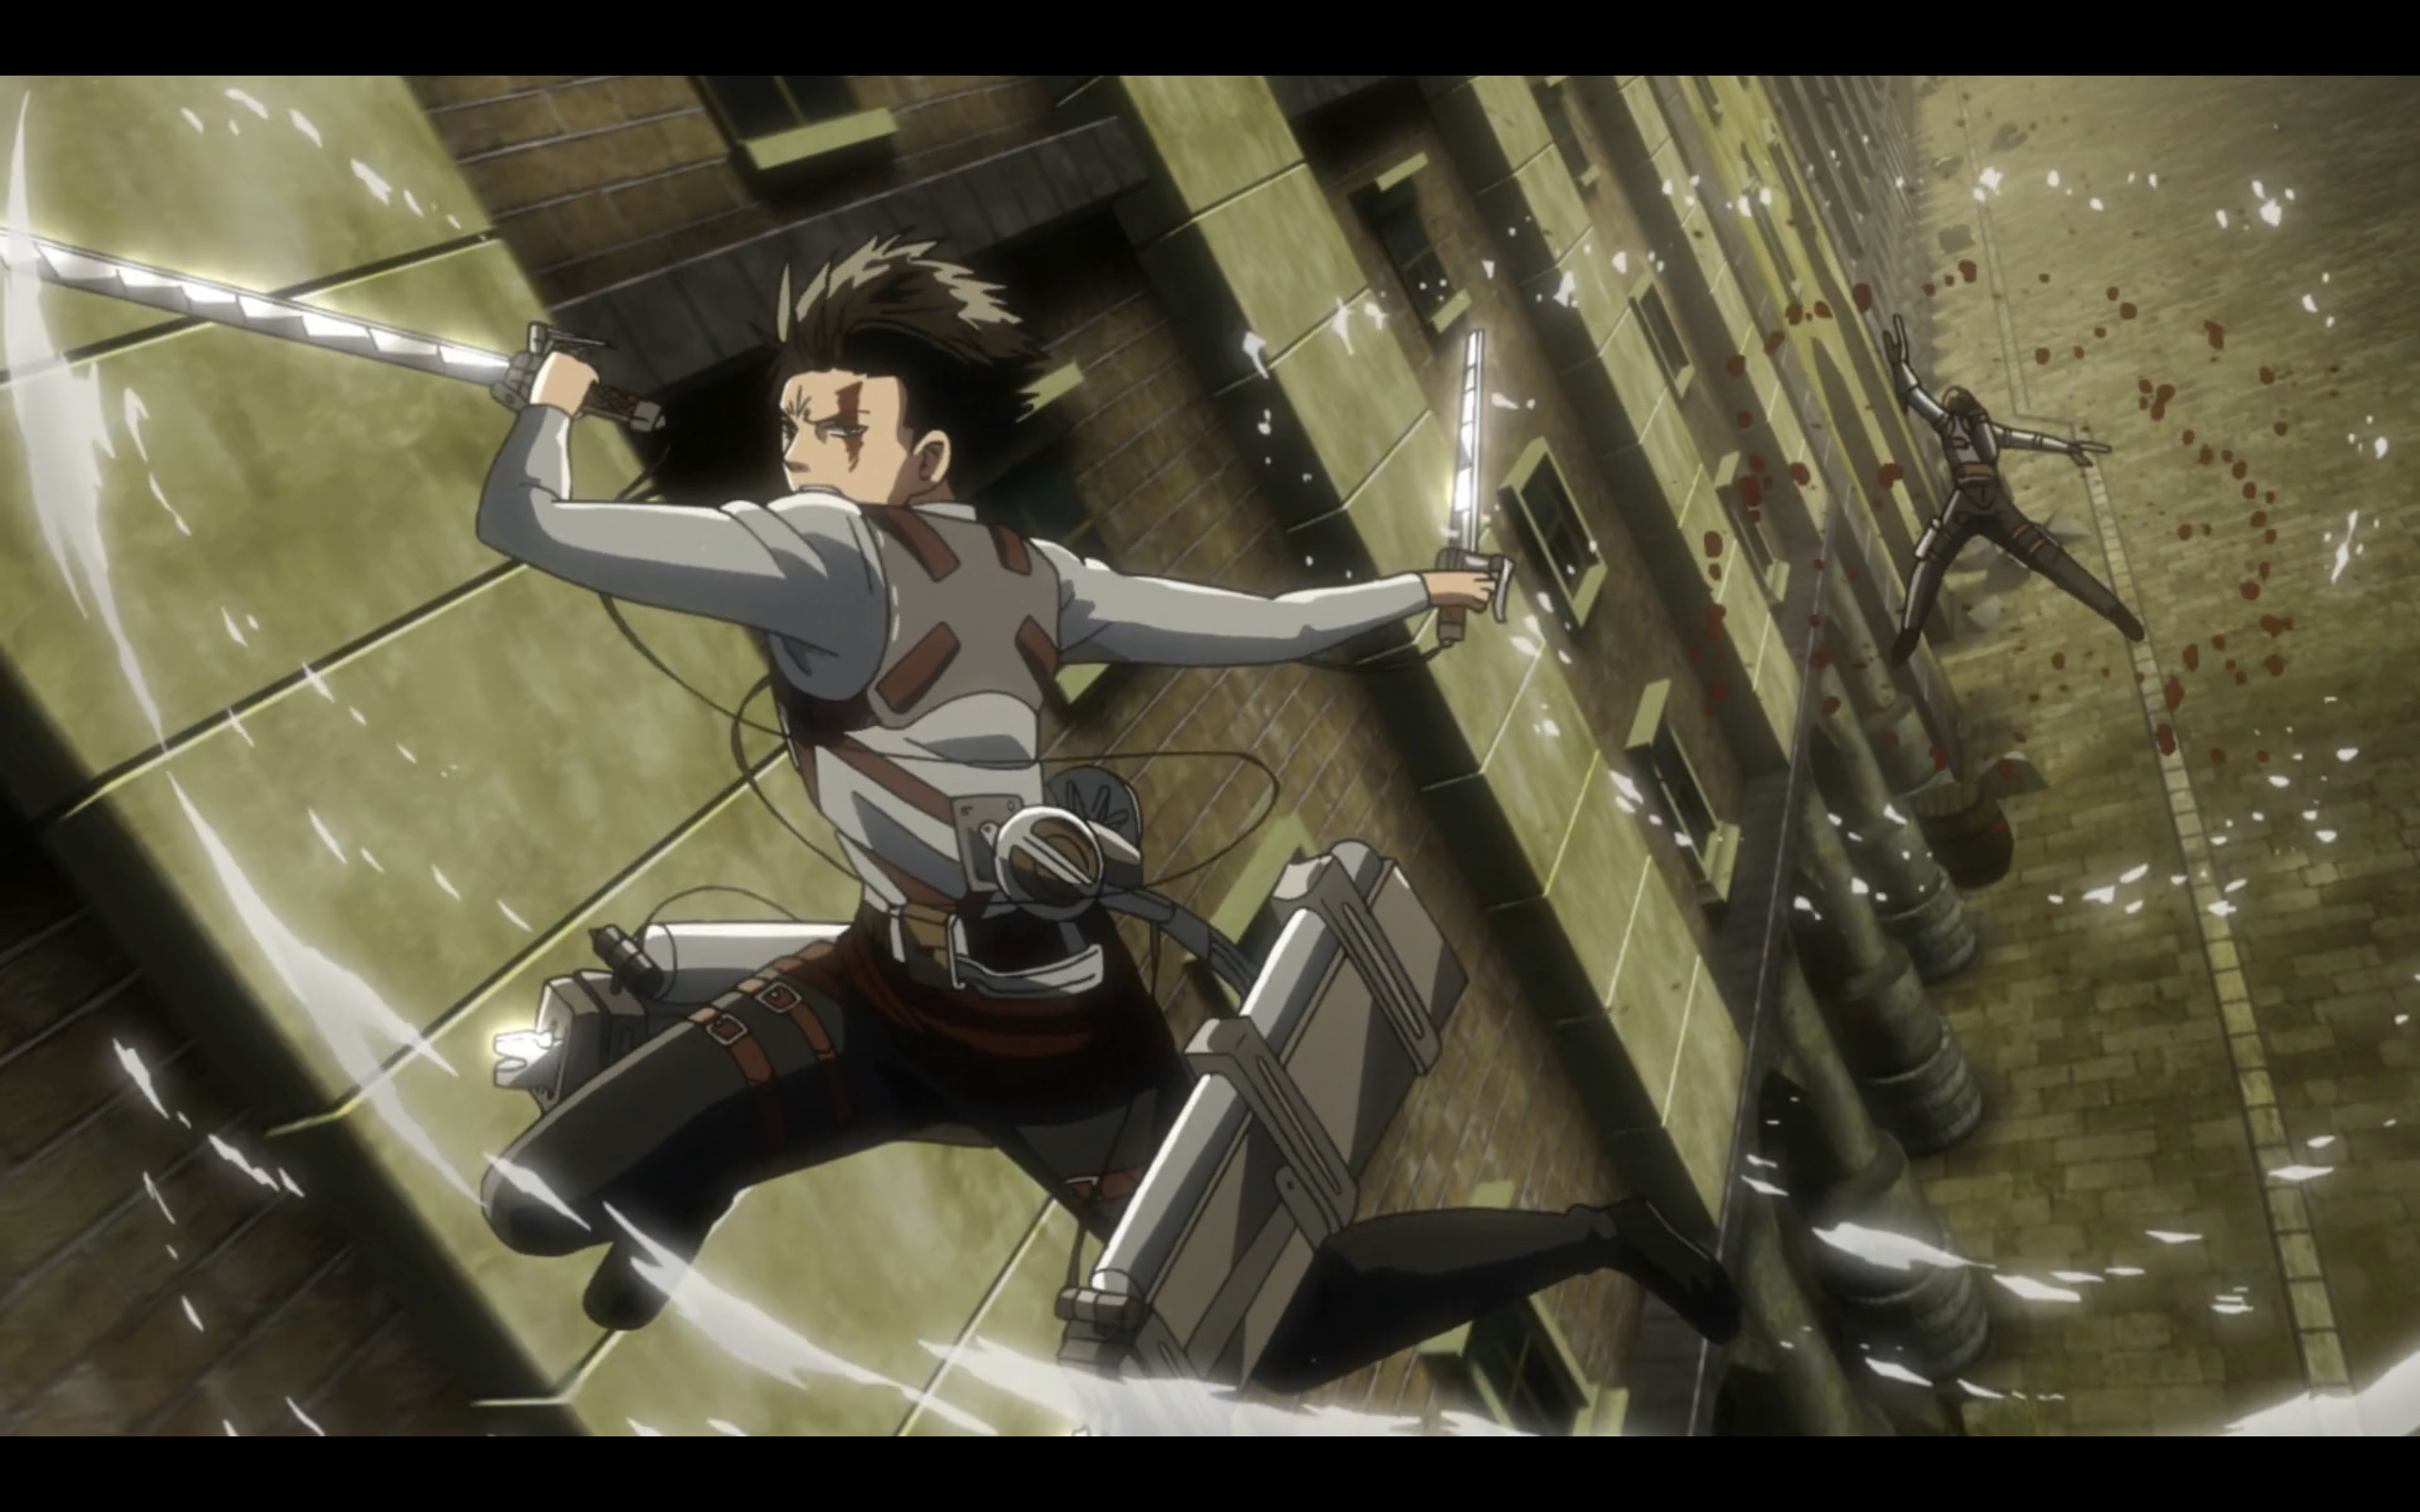 Attack on Titan Season 3 Episode 2 Review - Perfection - VGCultureHQ